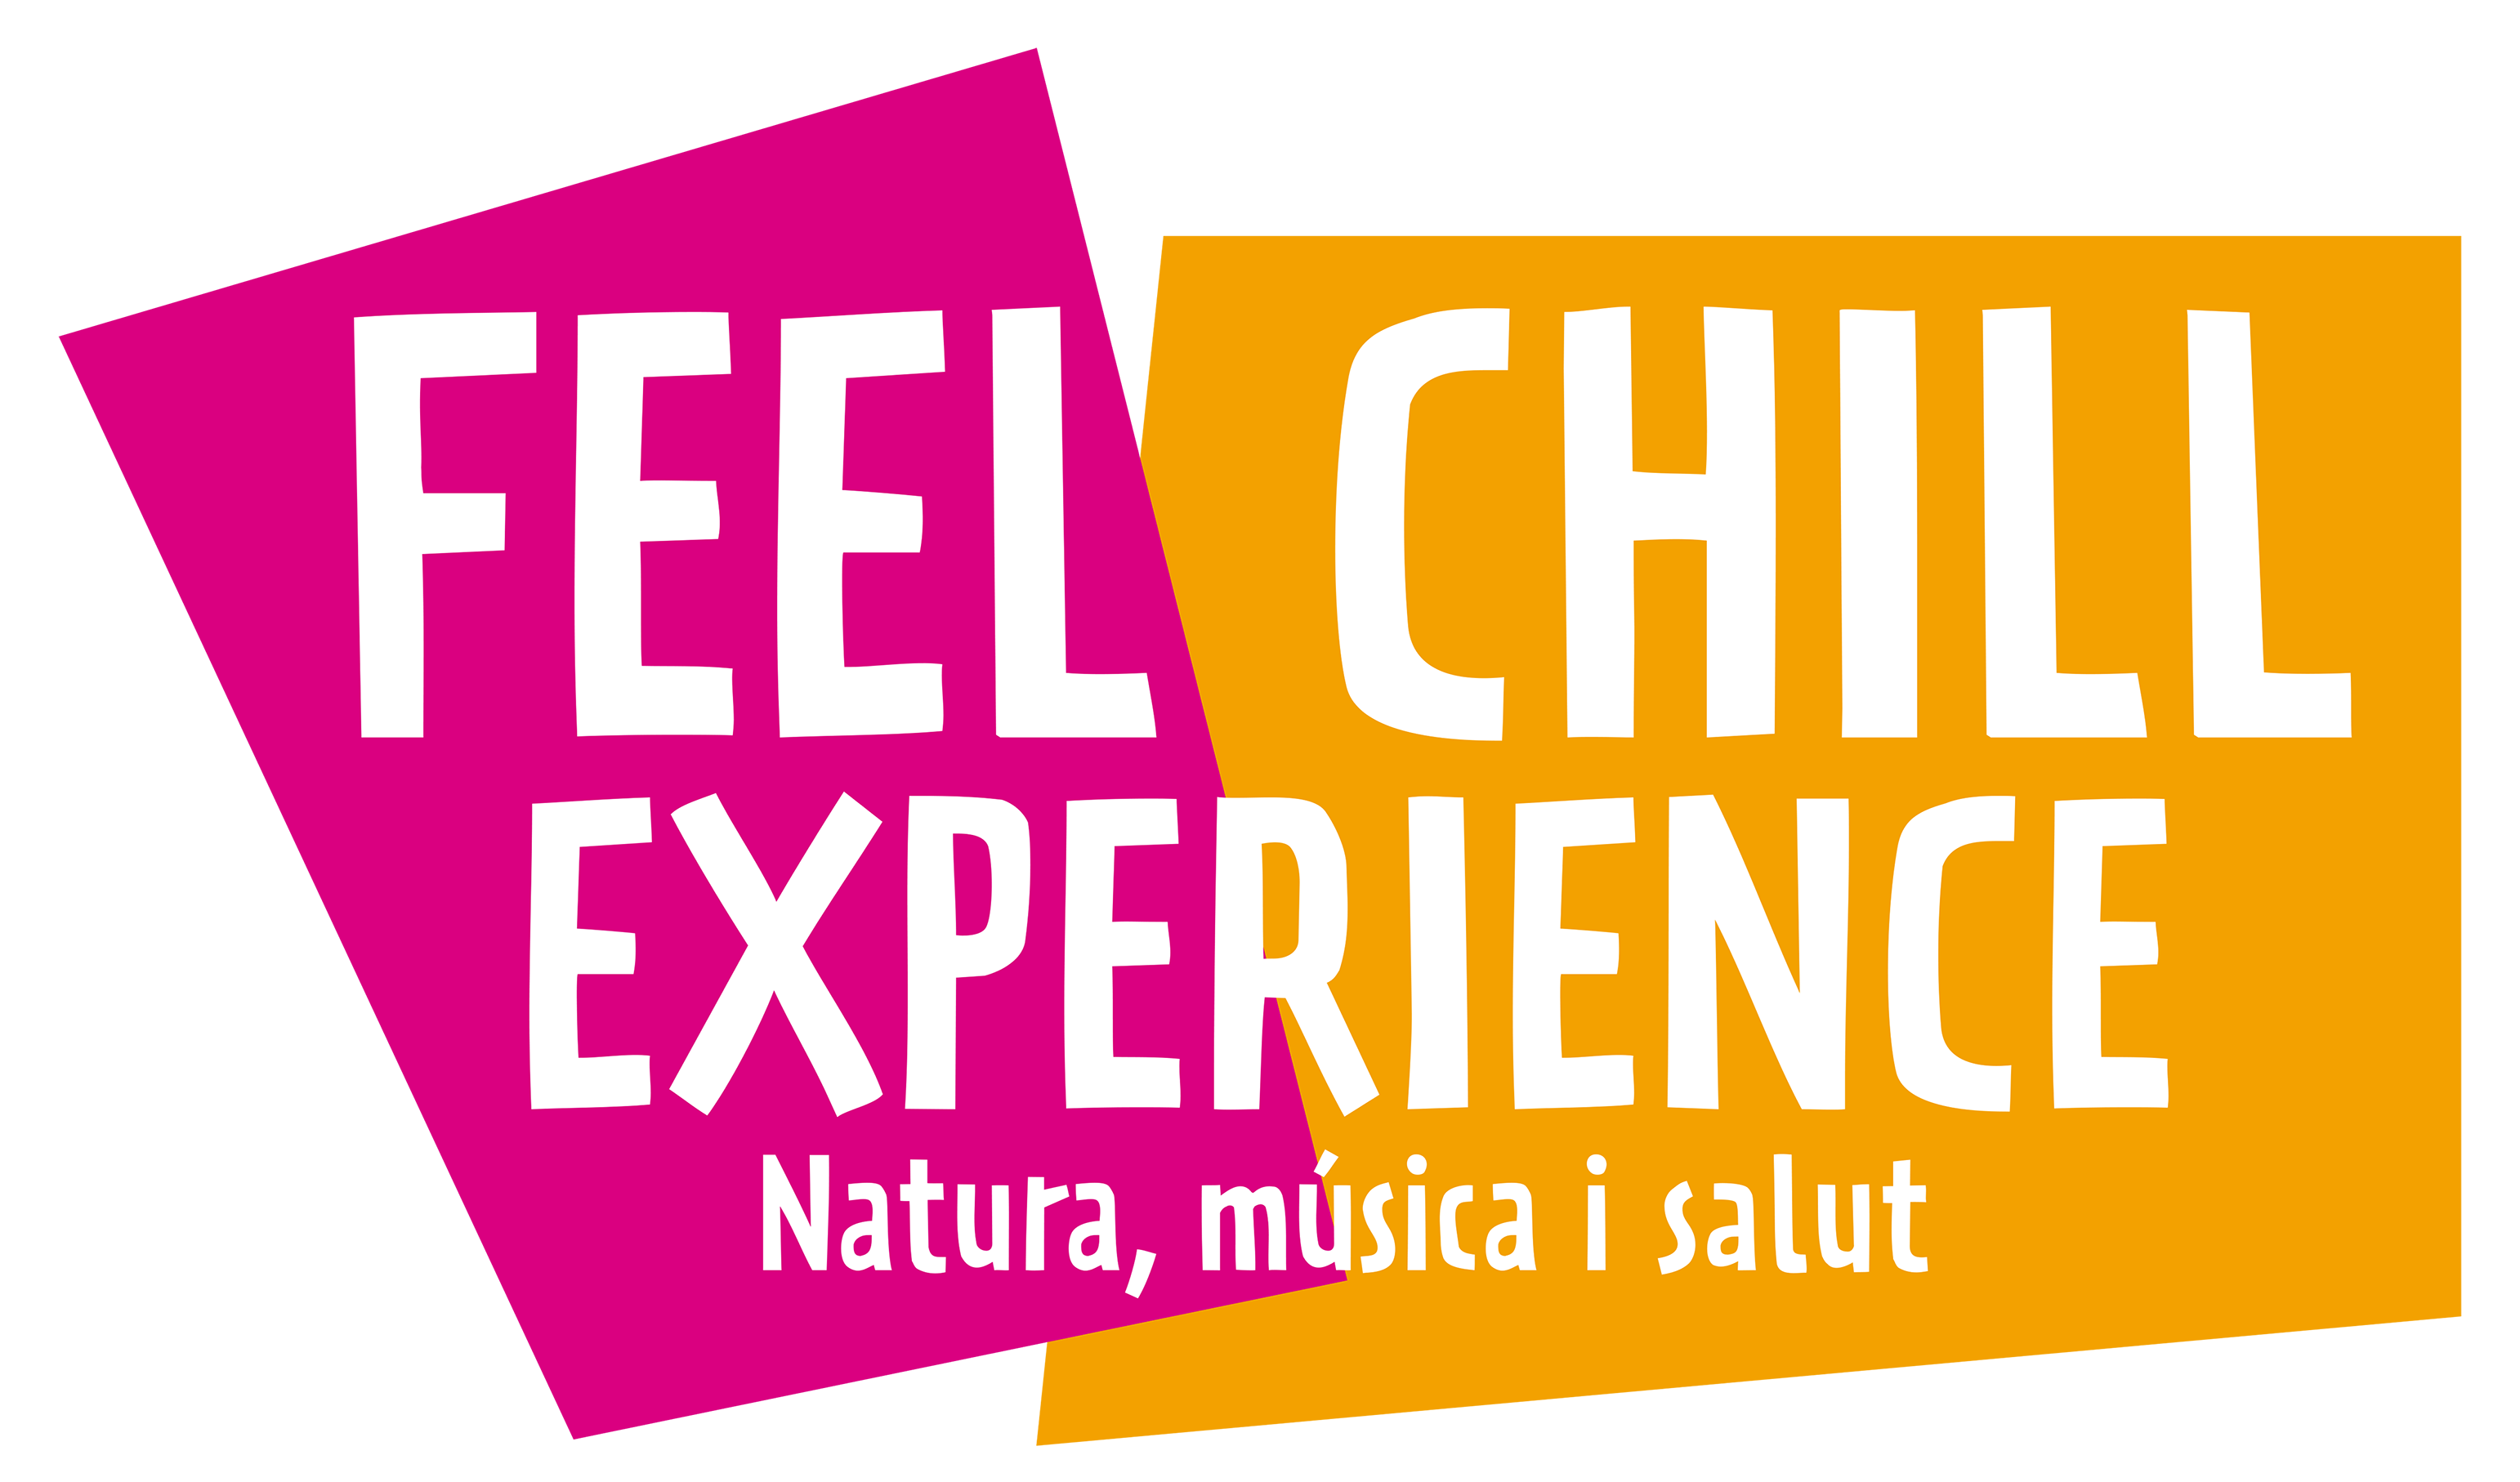 feelchillexperience - Natura, música i salut.